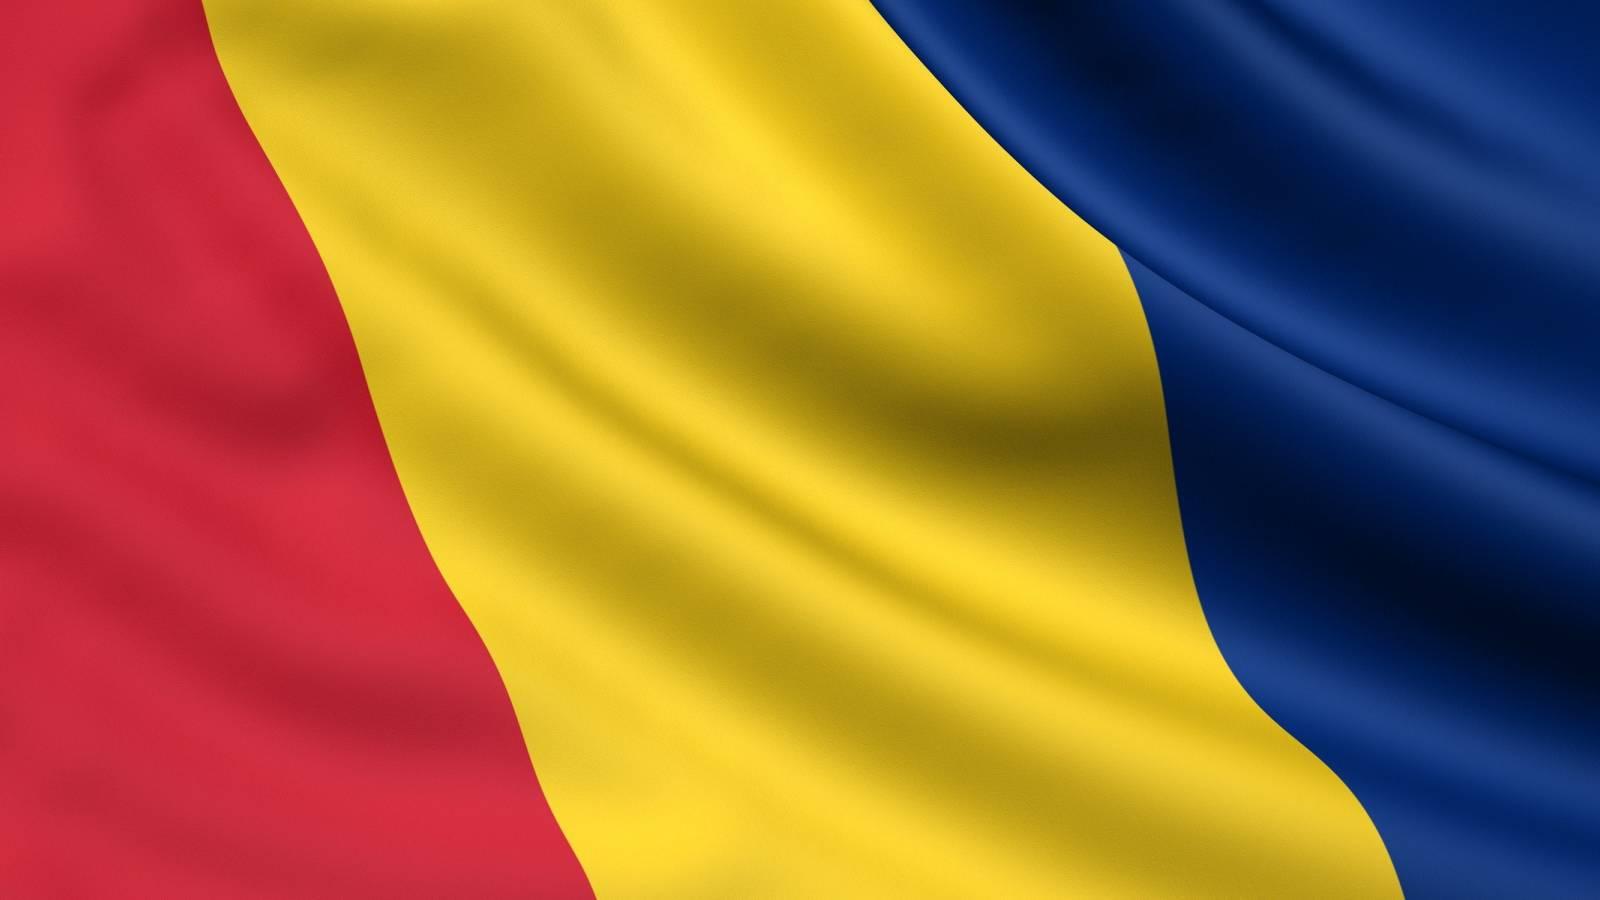 Vaccinarea Impotriva Coronavirus in Romania Continua cu 12.082 Imunizari